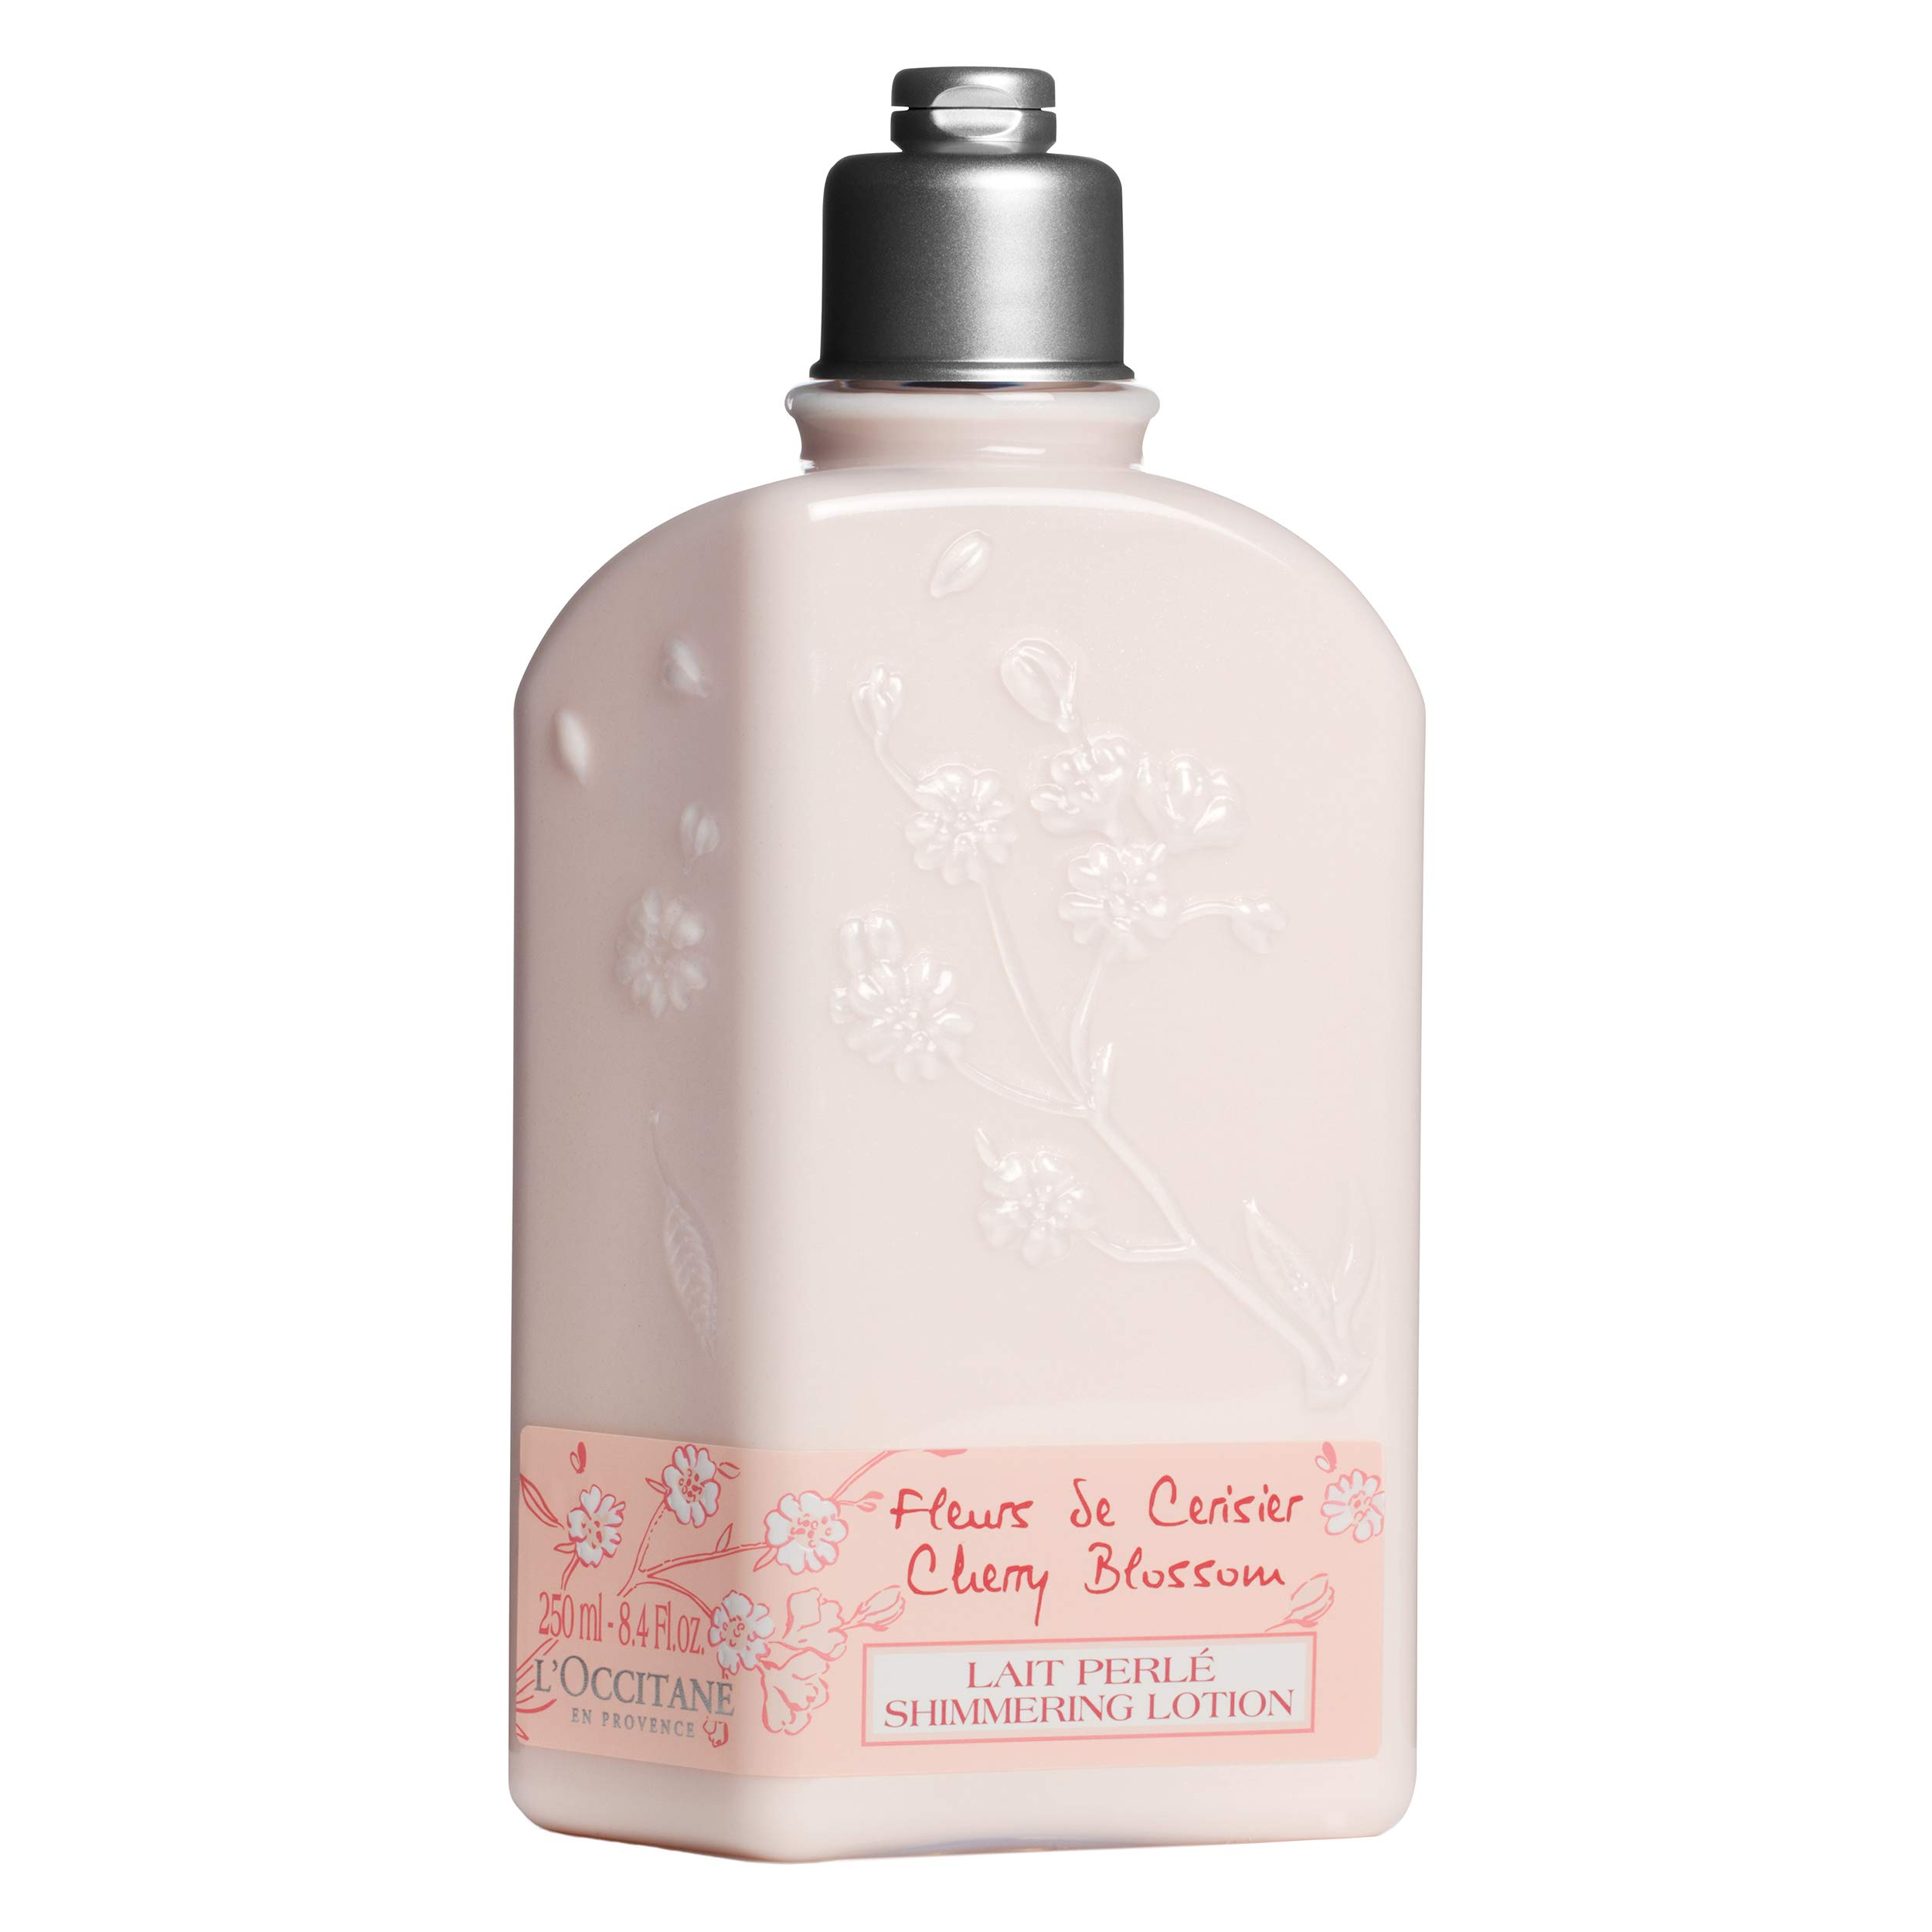 L'Occitane Cherry Blossom Body Lotion, 8.4 Fl Oz